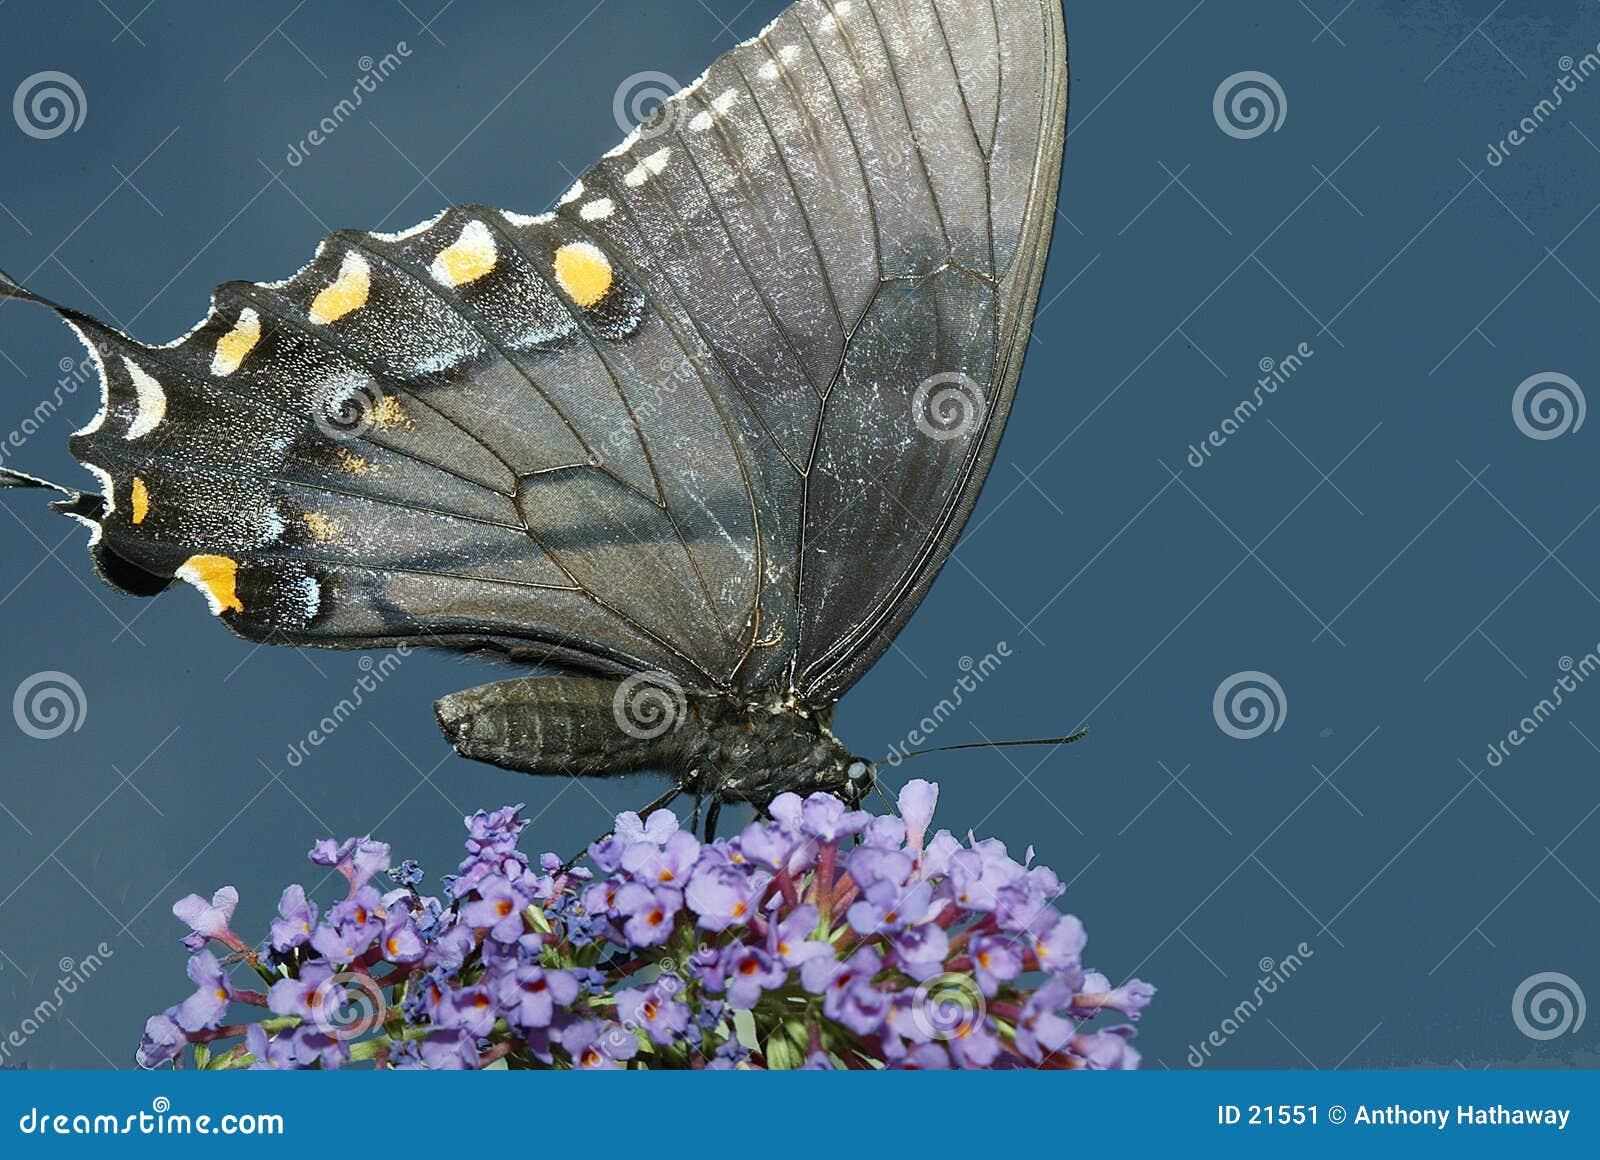 Farfalla di Swallowtail